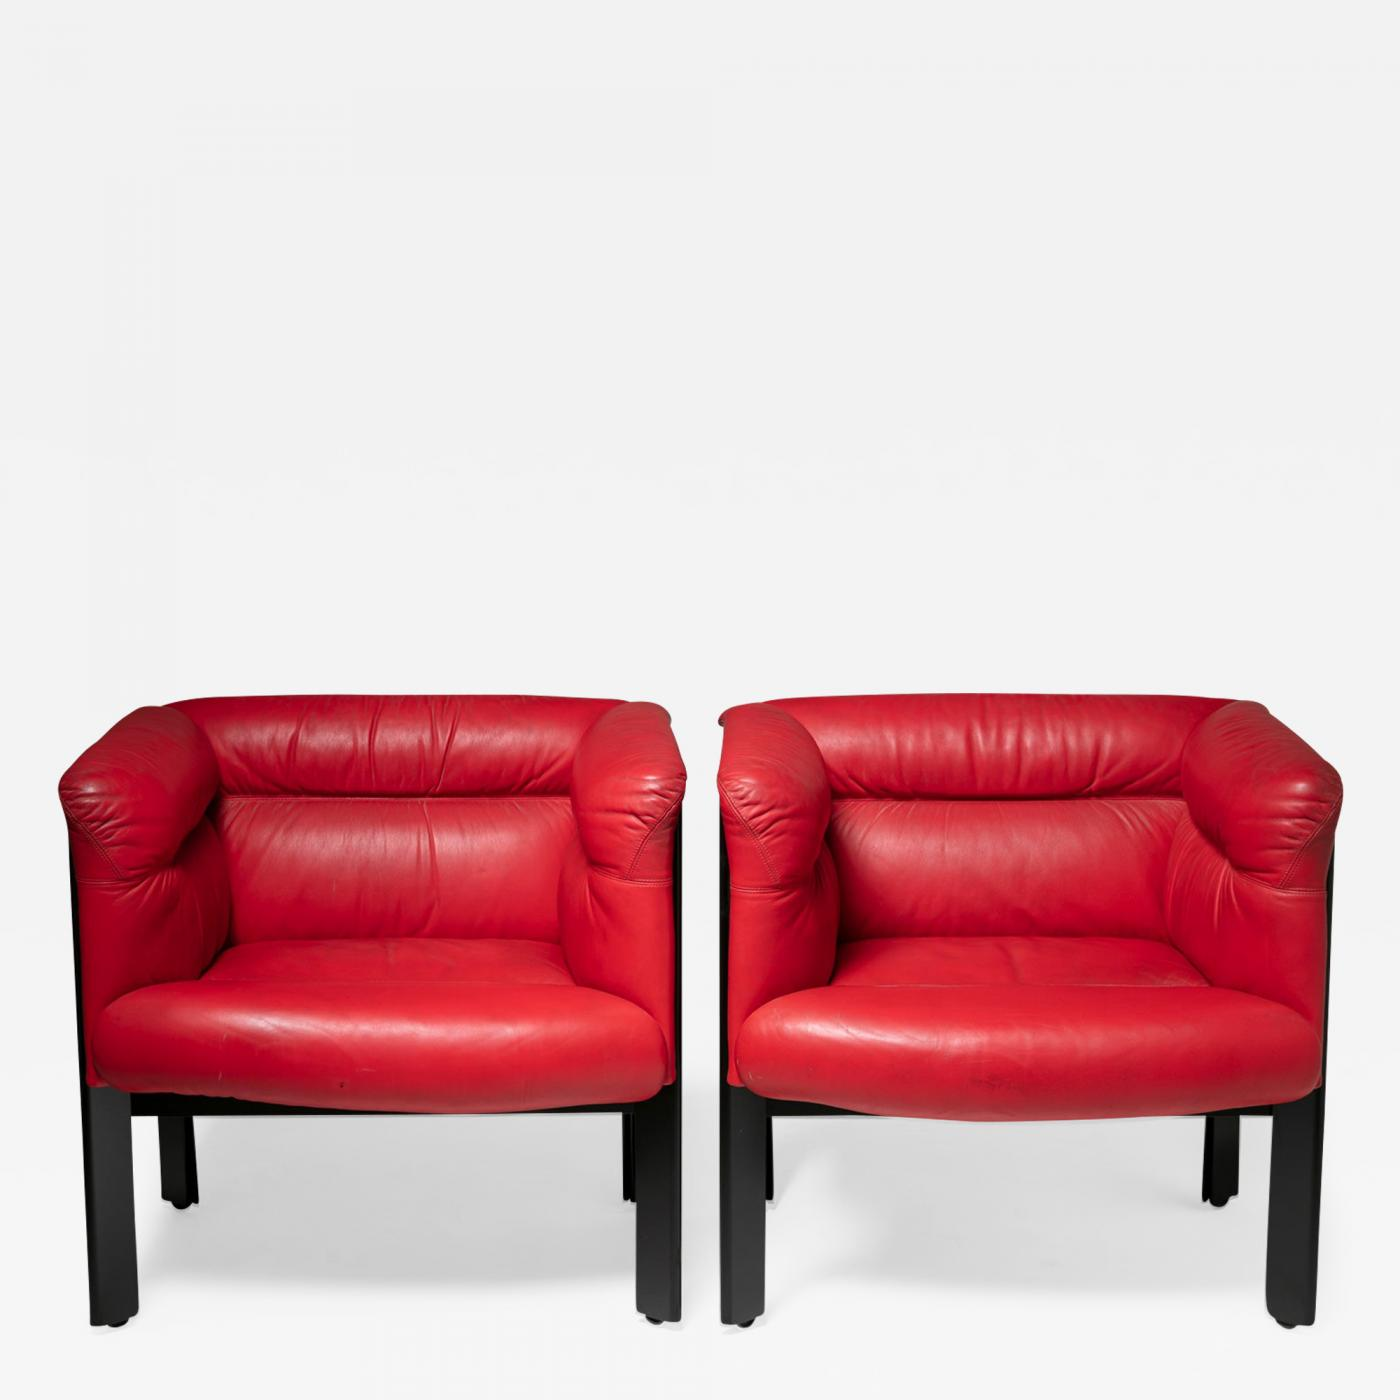 Poltrona Marco Zanuso.Marco Zanuso Pair Of Interlude Chairs By Marco Zanuso For Poltrona Frau